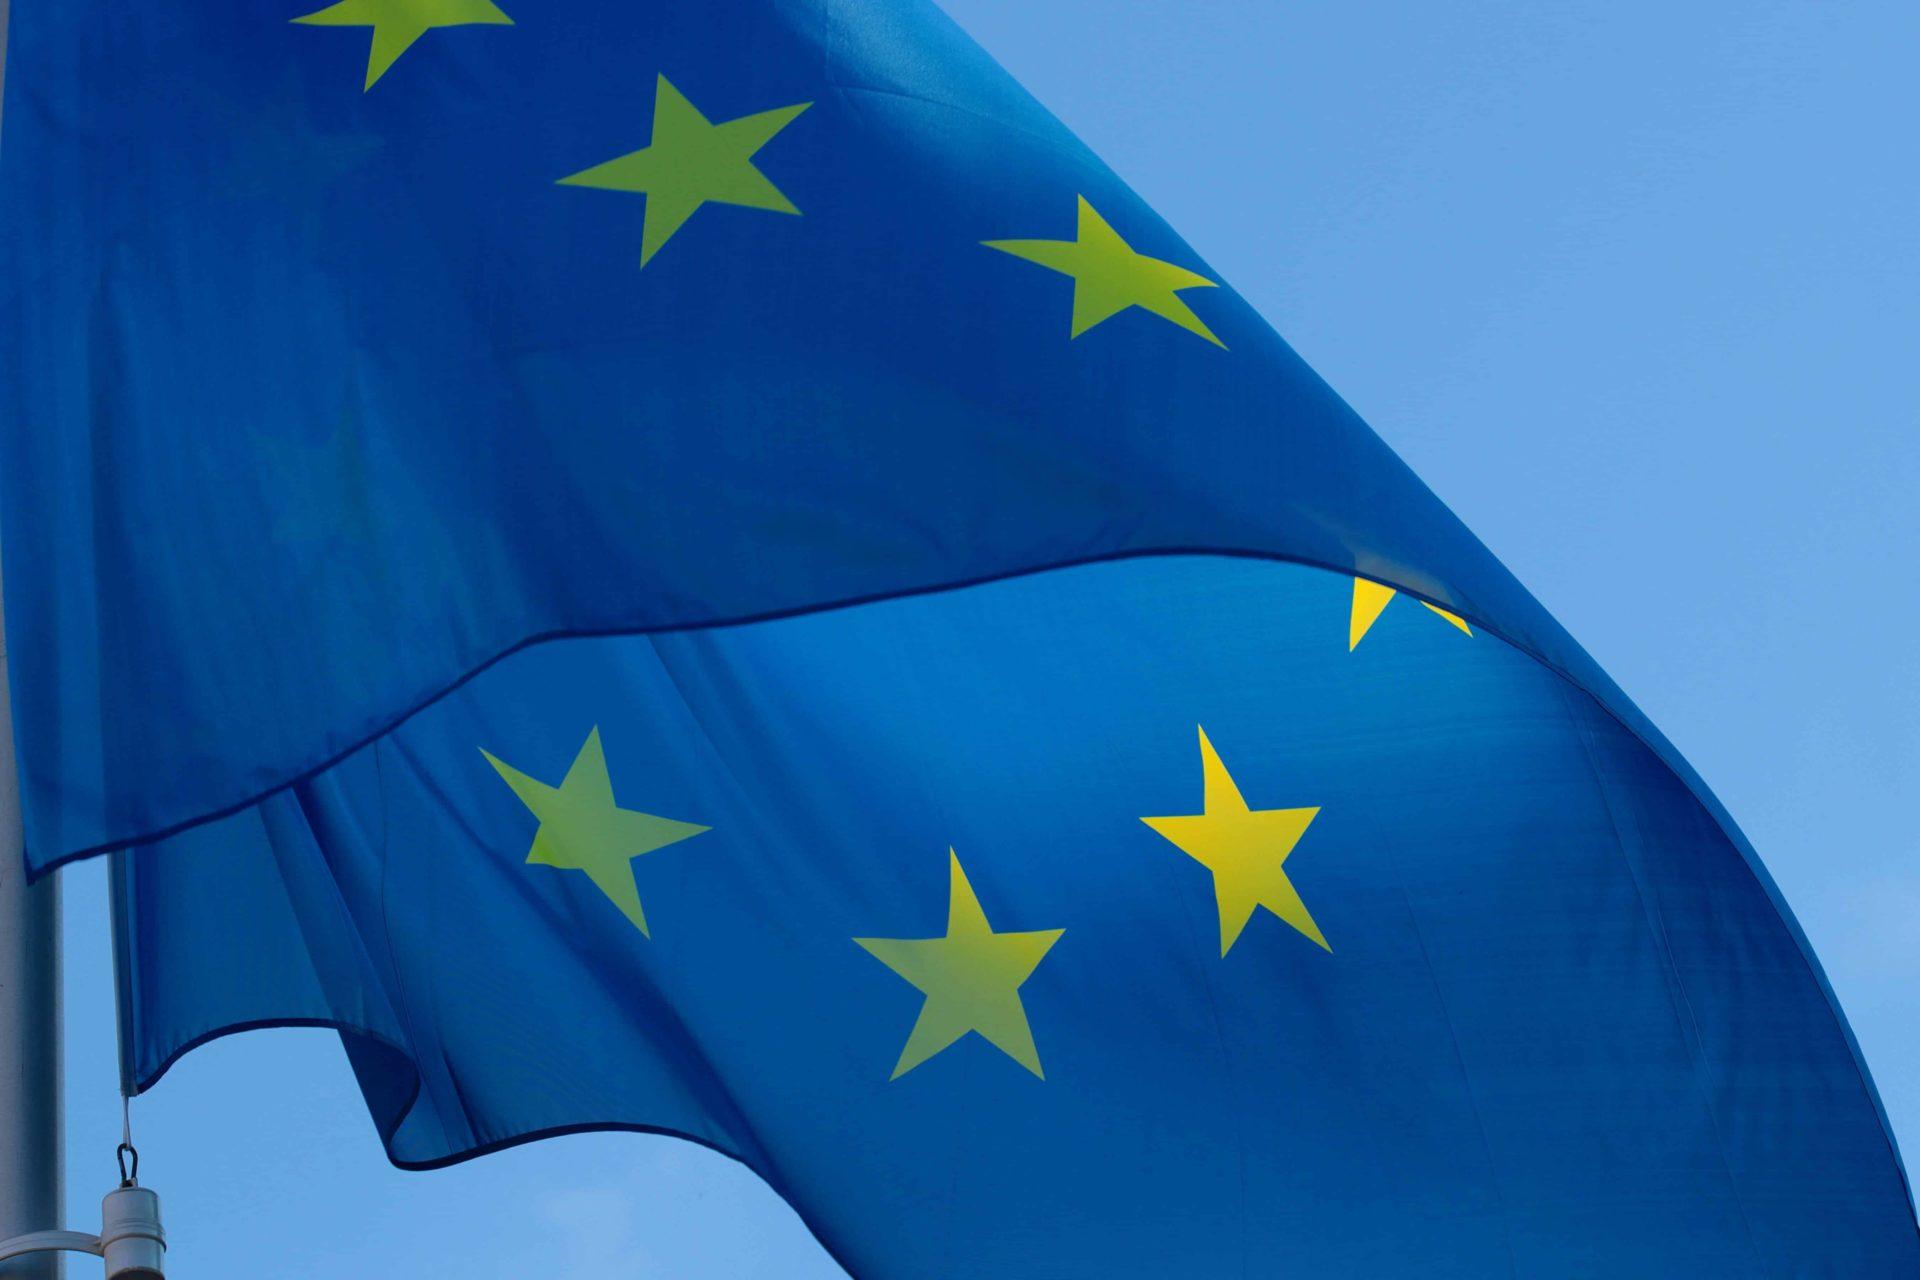 bandiere-europa-